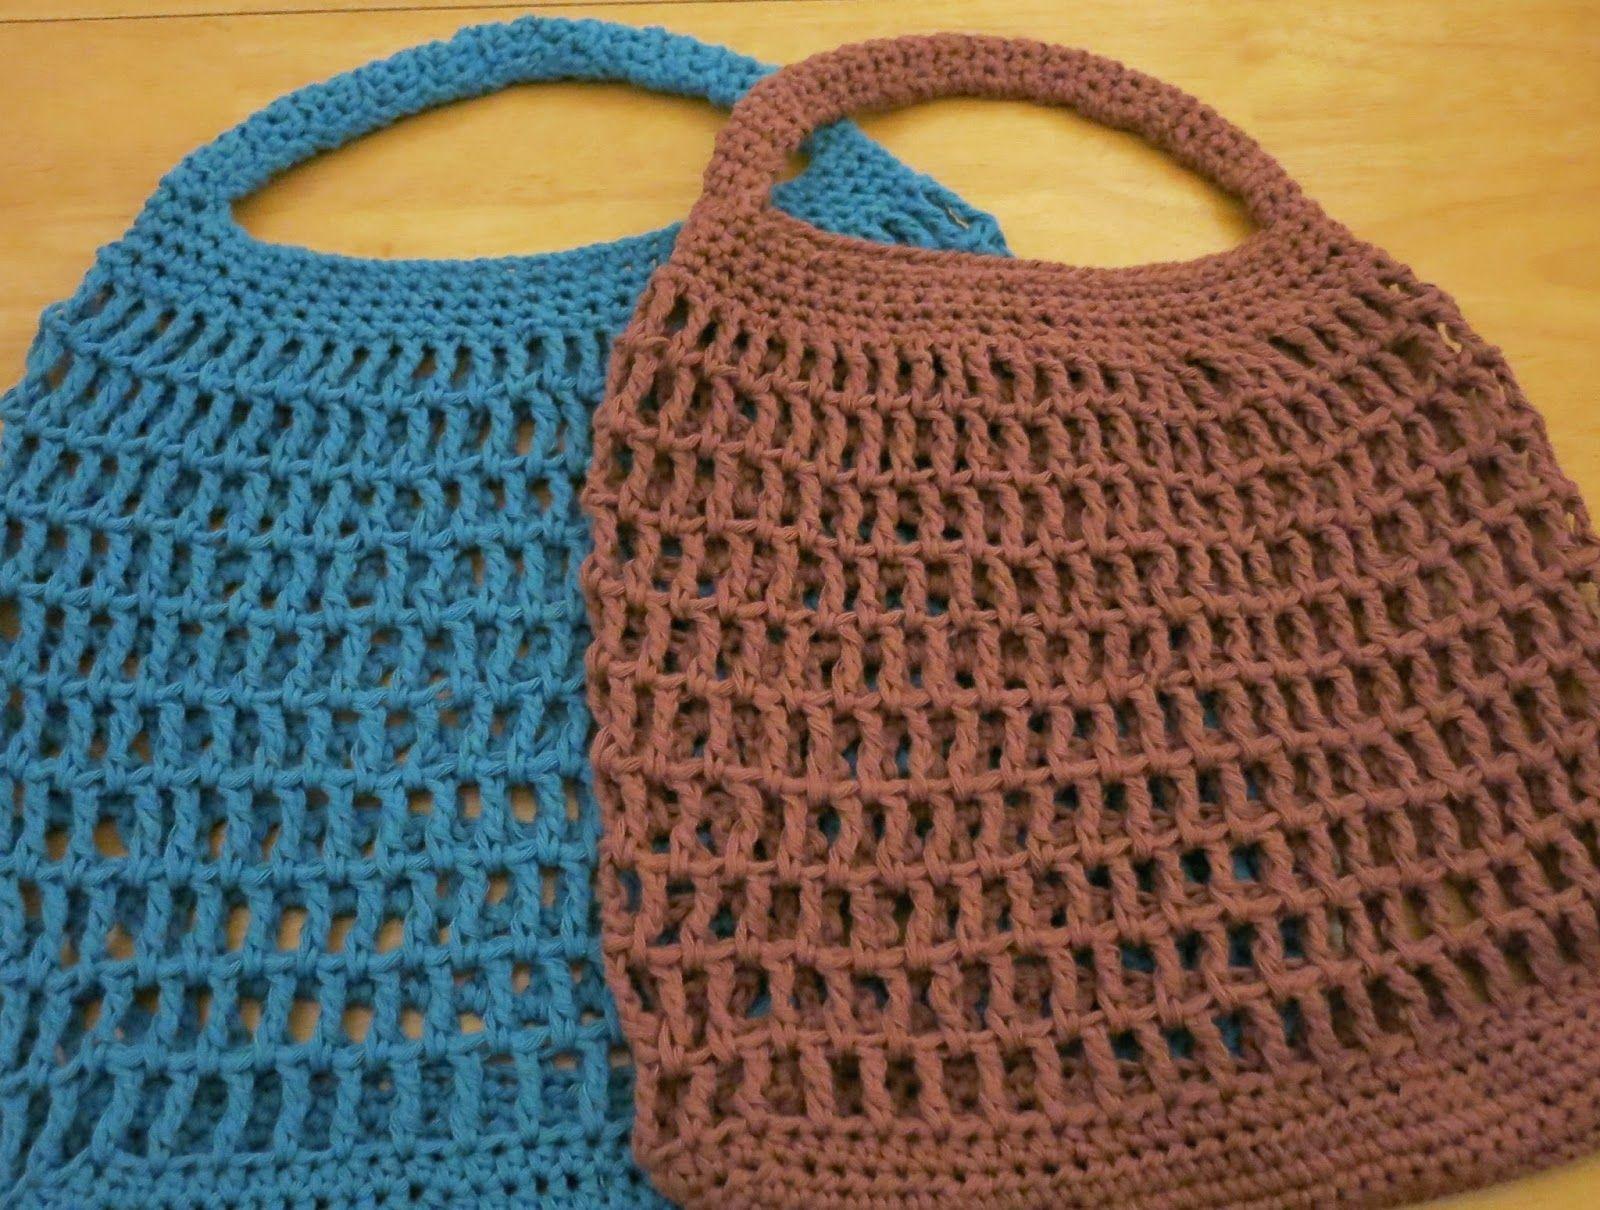 Crochet Market bags Free pattern-Da\'s Crochet Connection ...